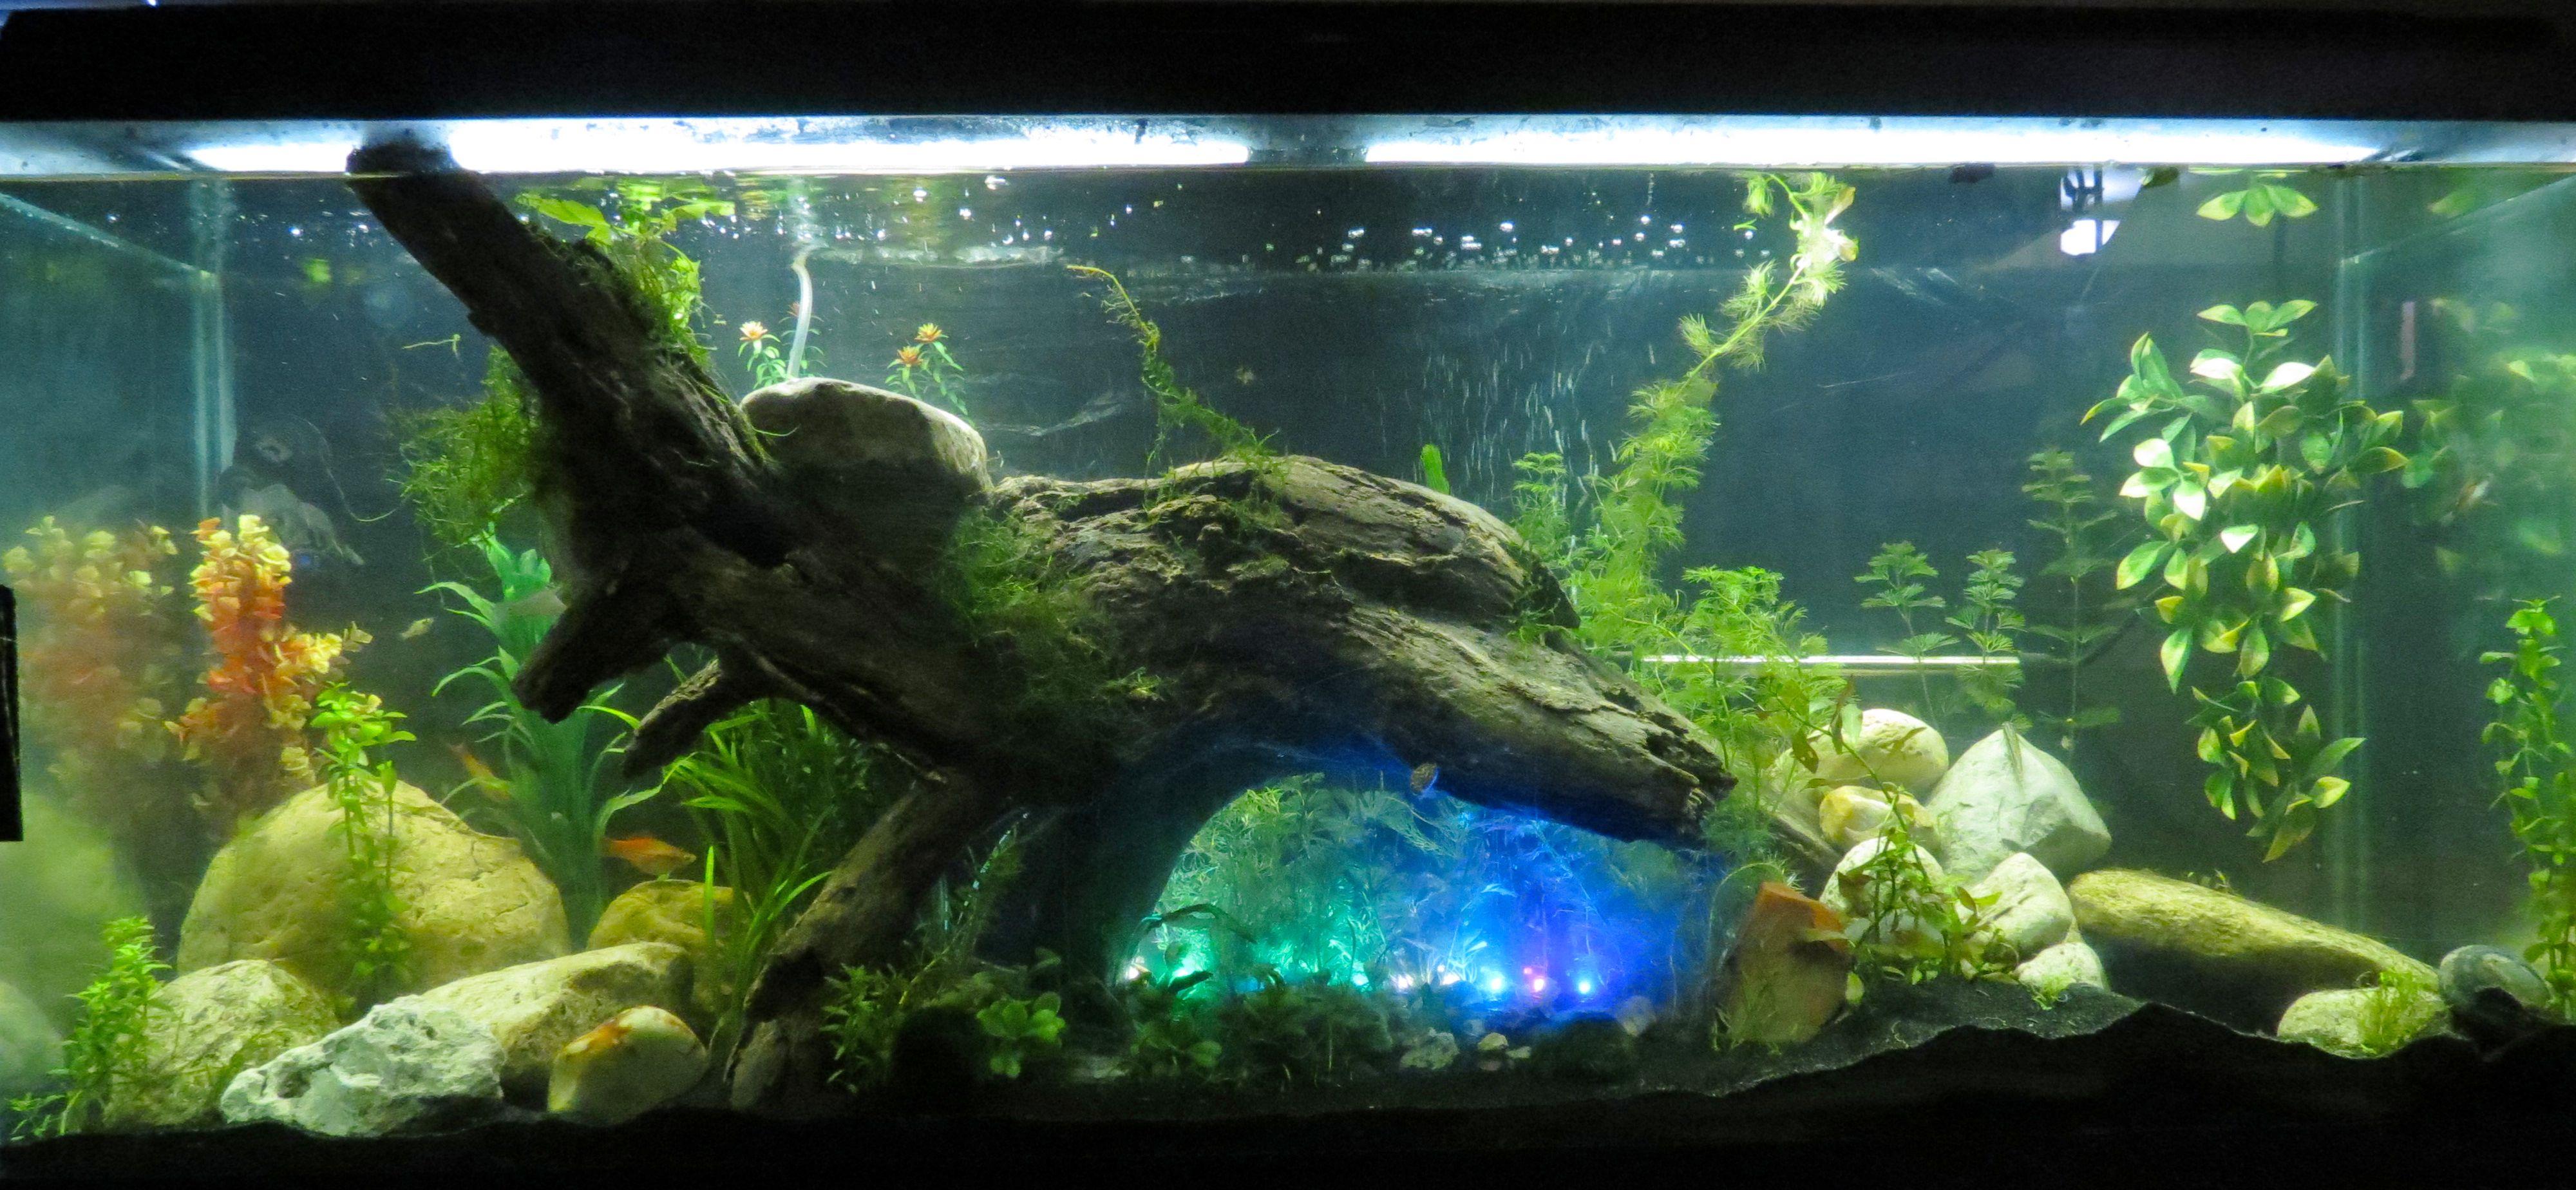 55 gallon fish tank ideas member spotlight butterfly for Freshwater fish tank ideas